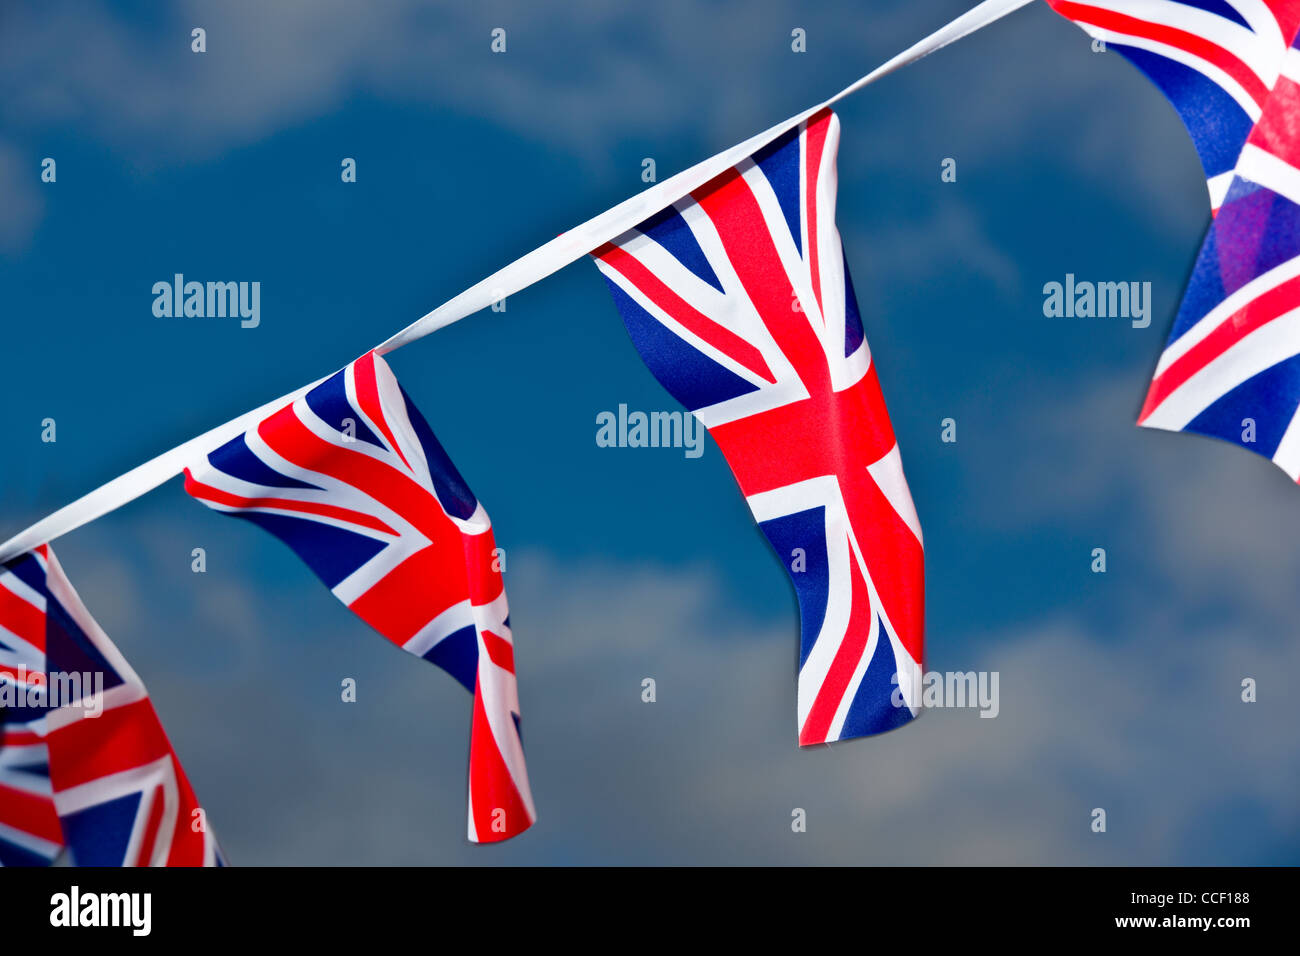 Patriotic 'Union Jack' Bunting - Stock Image